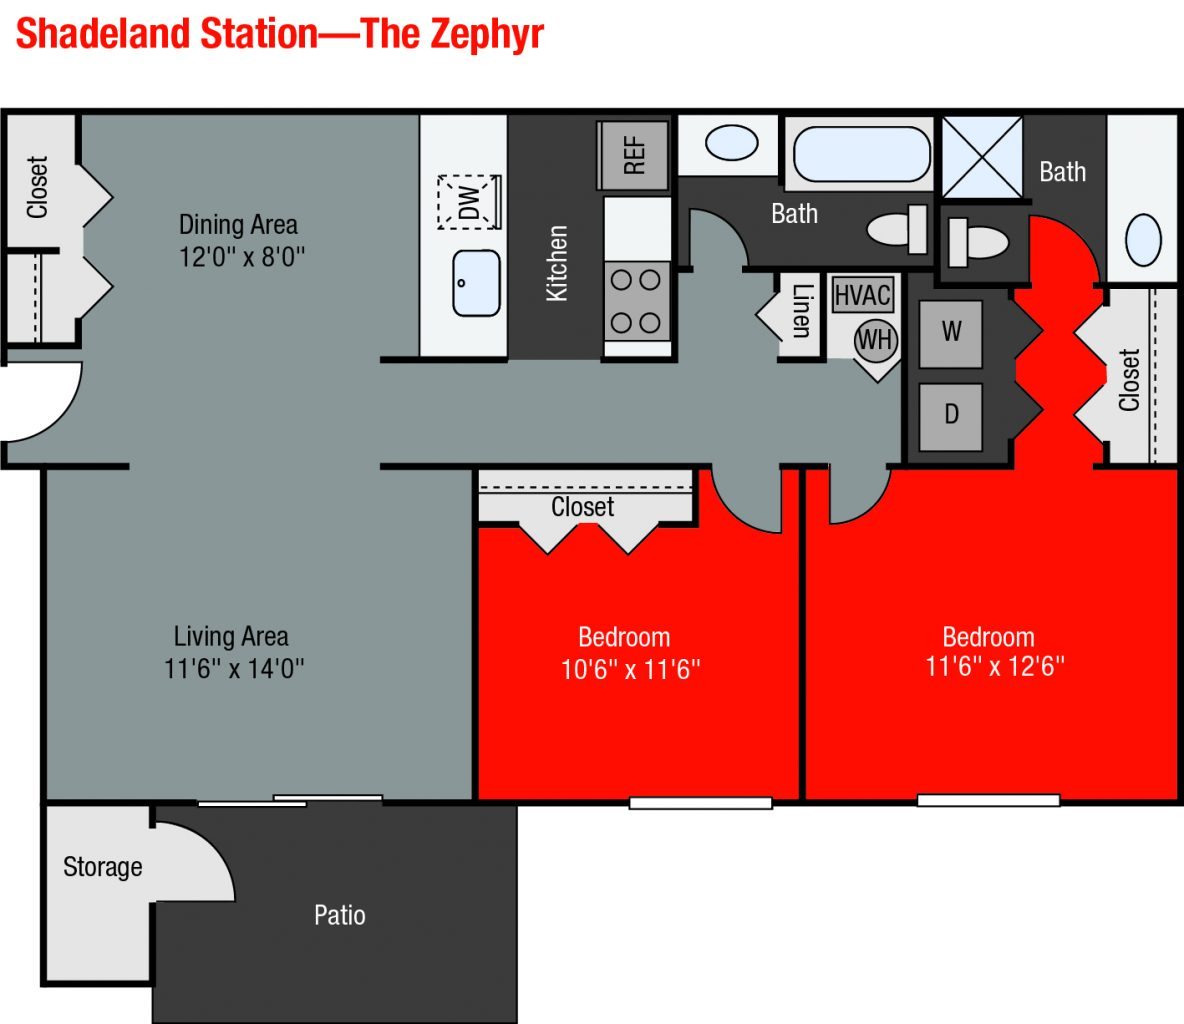 Apartments For Rent TGM Shadeland Station - Zephyr